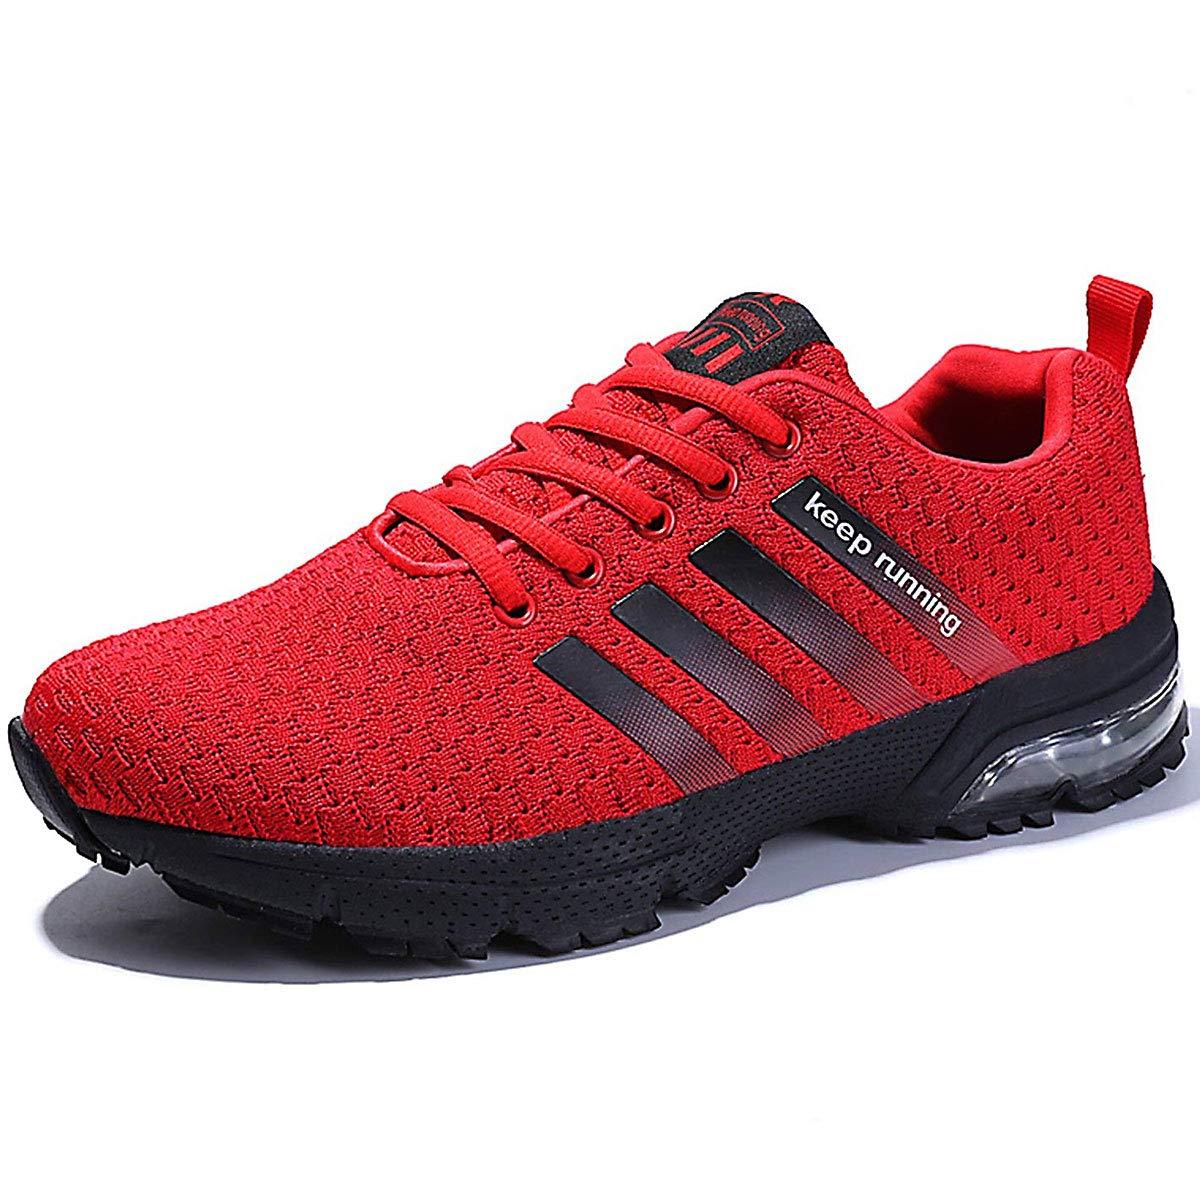 CHNHIRA Laufschuhe Herren Damen Turnschuhe Straßenlaufschuhe Sneaker Sportschuhe